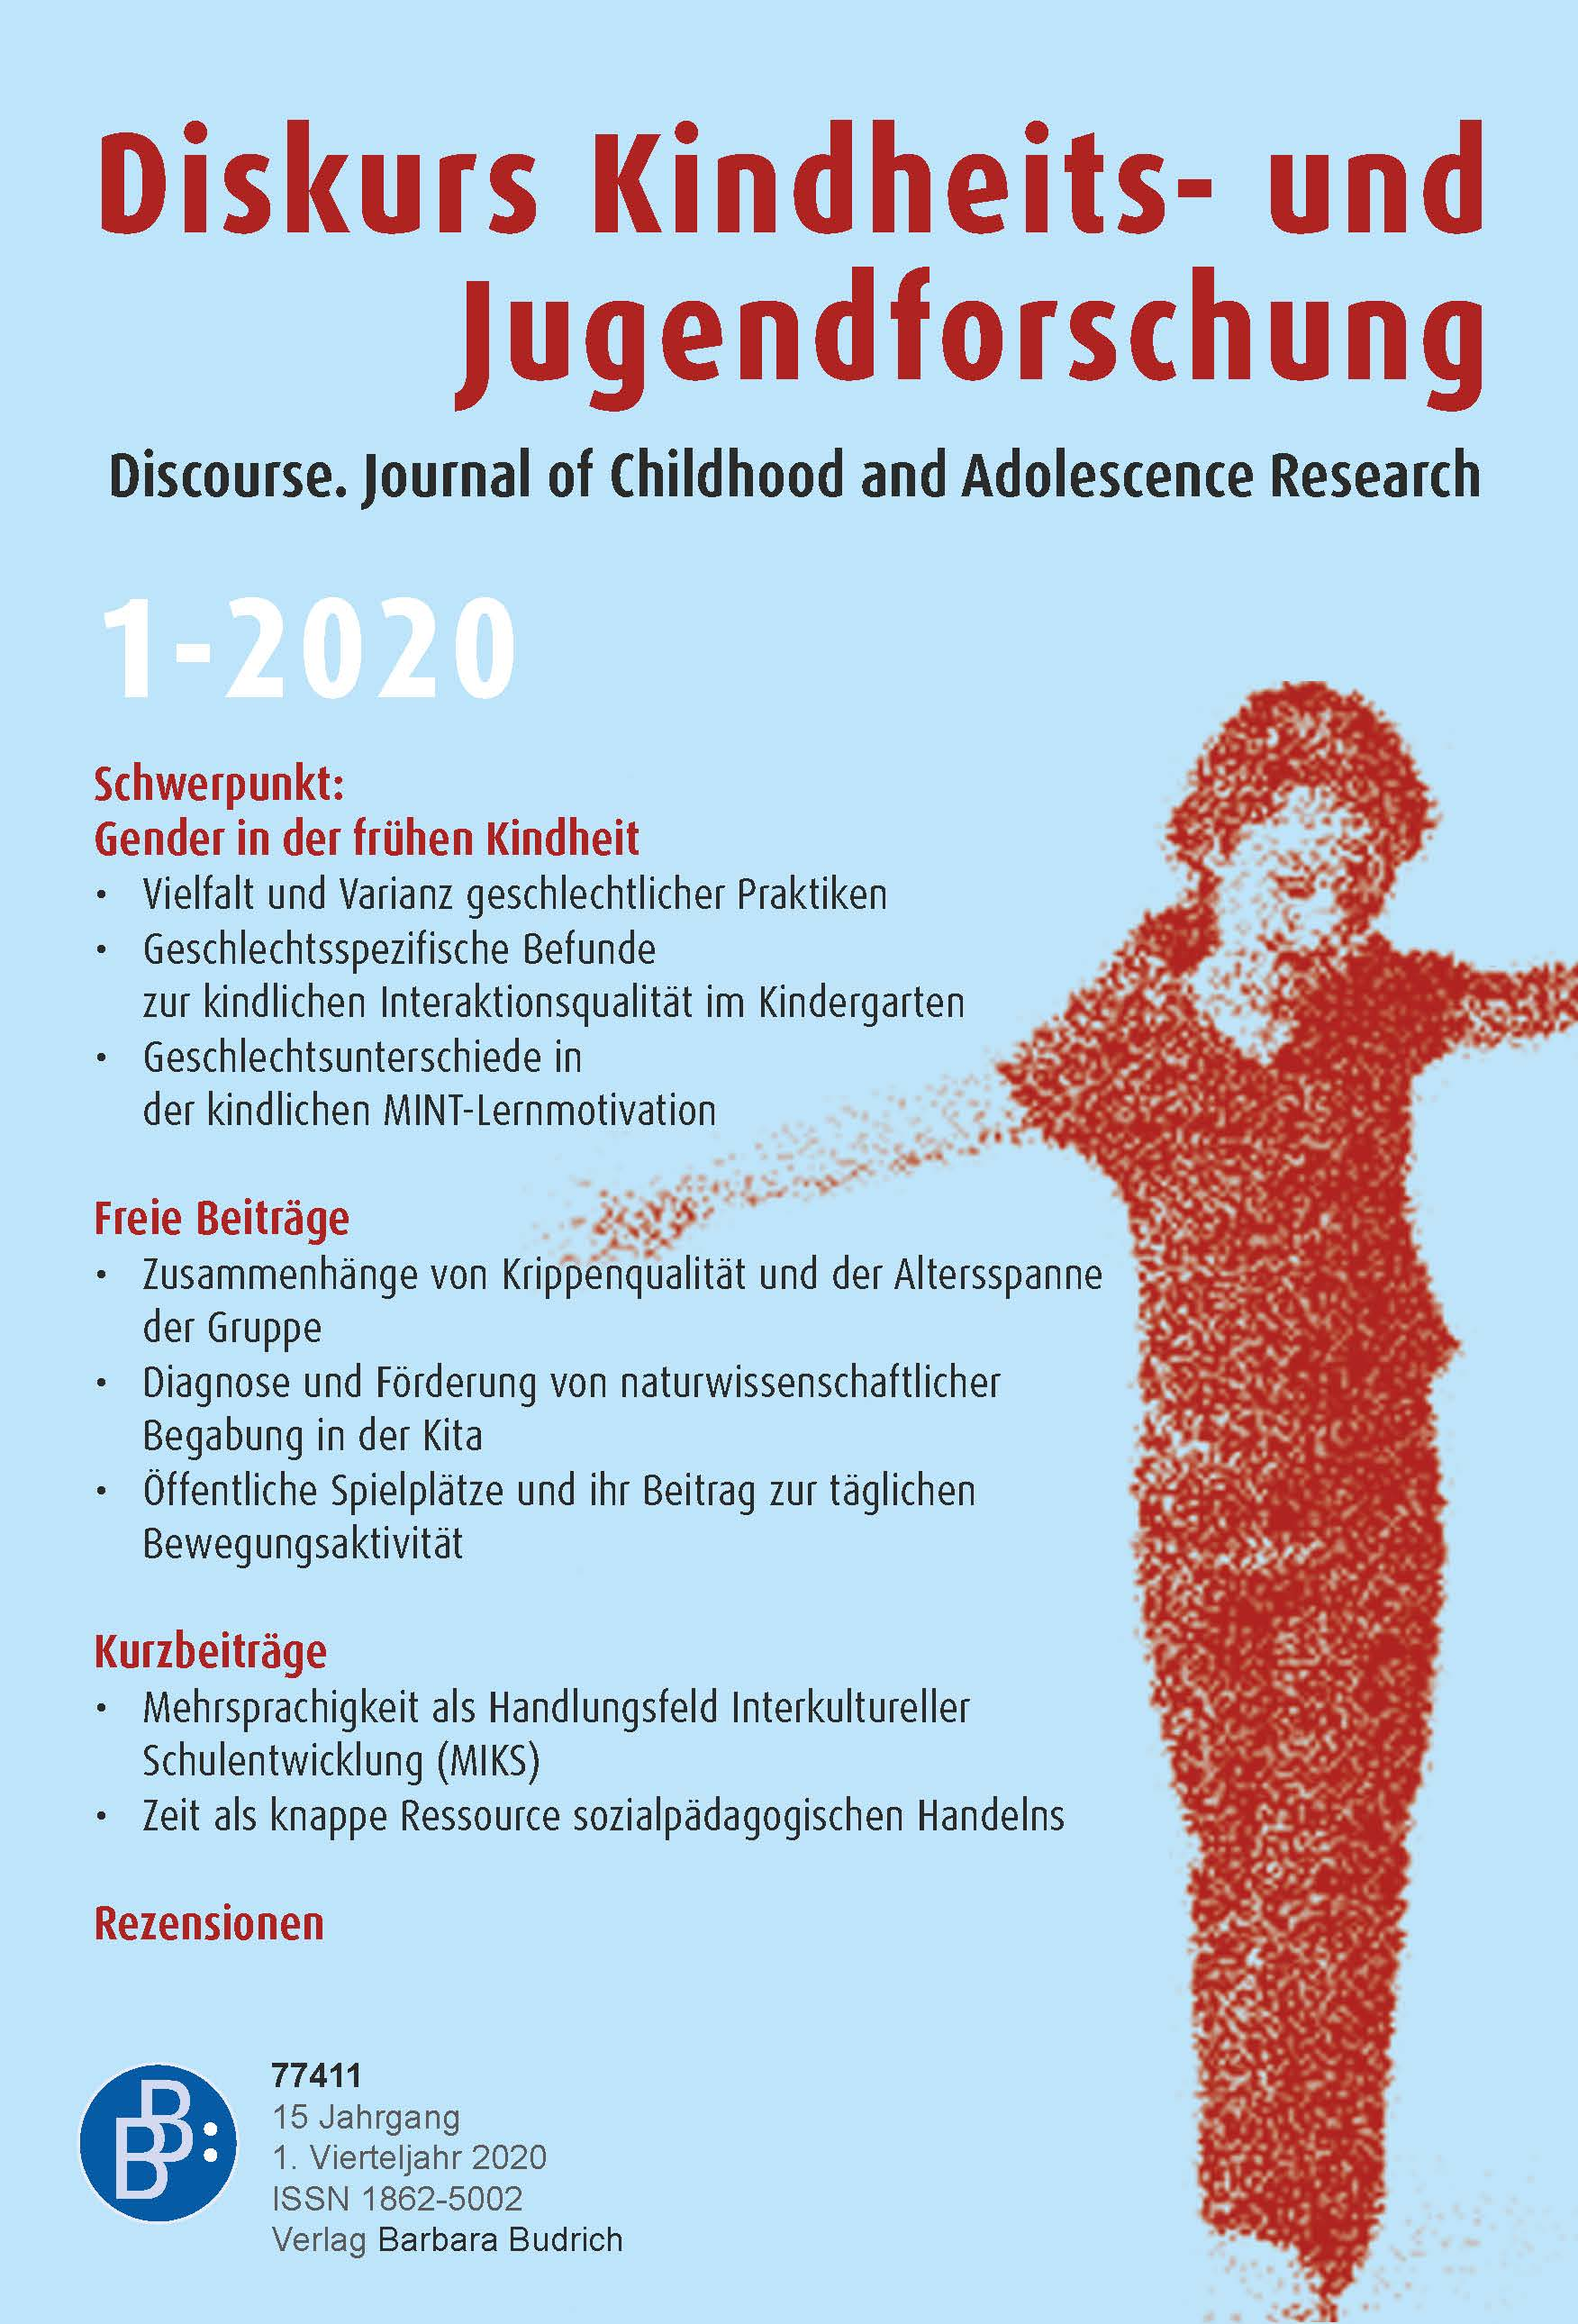 Diskurs Kindheits- und Jugendforschung / Discourse. Journal of Childhood and Adolescence Research 1-2020: Gender in der frühen Kindheit